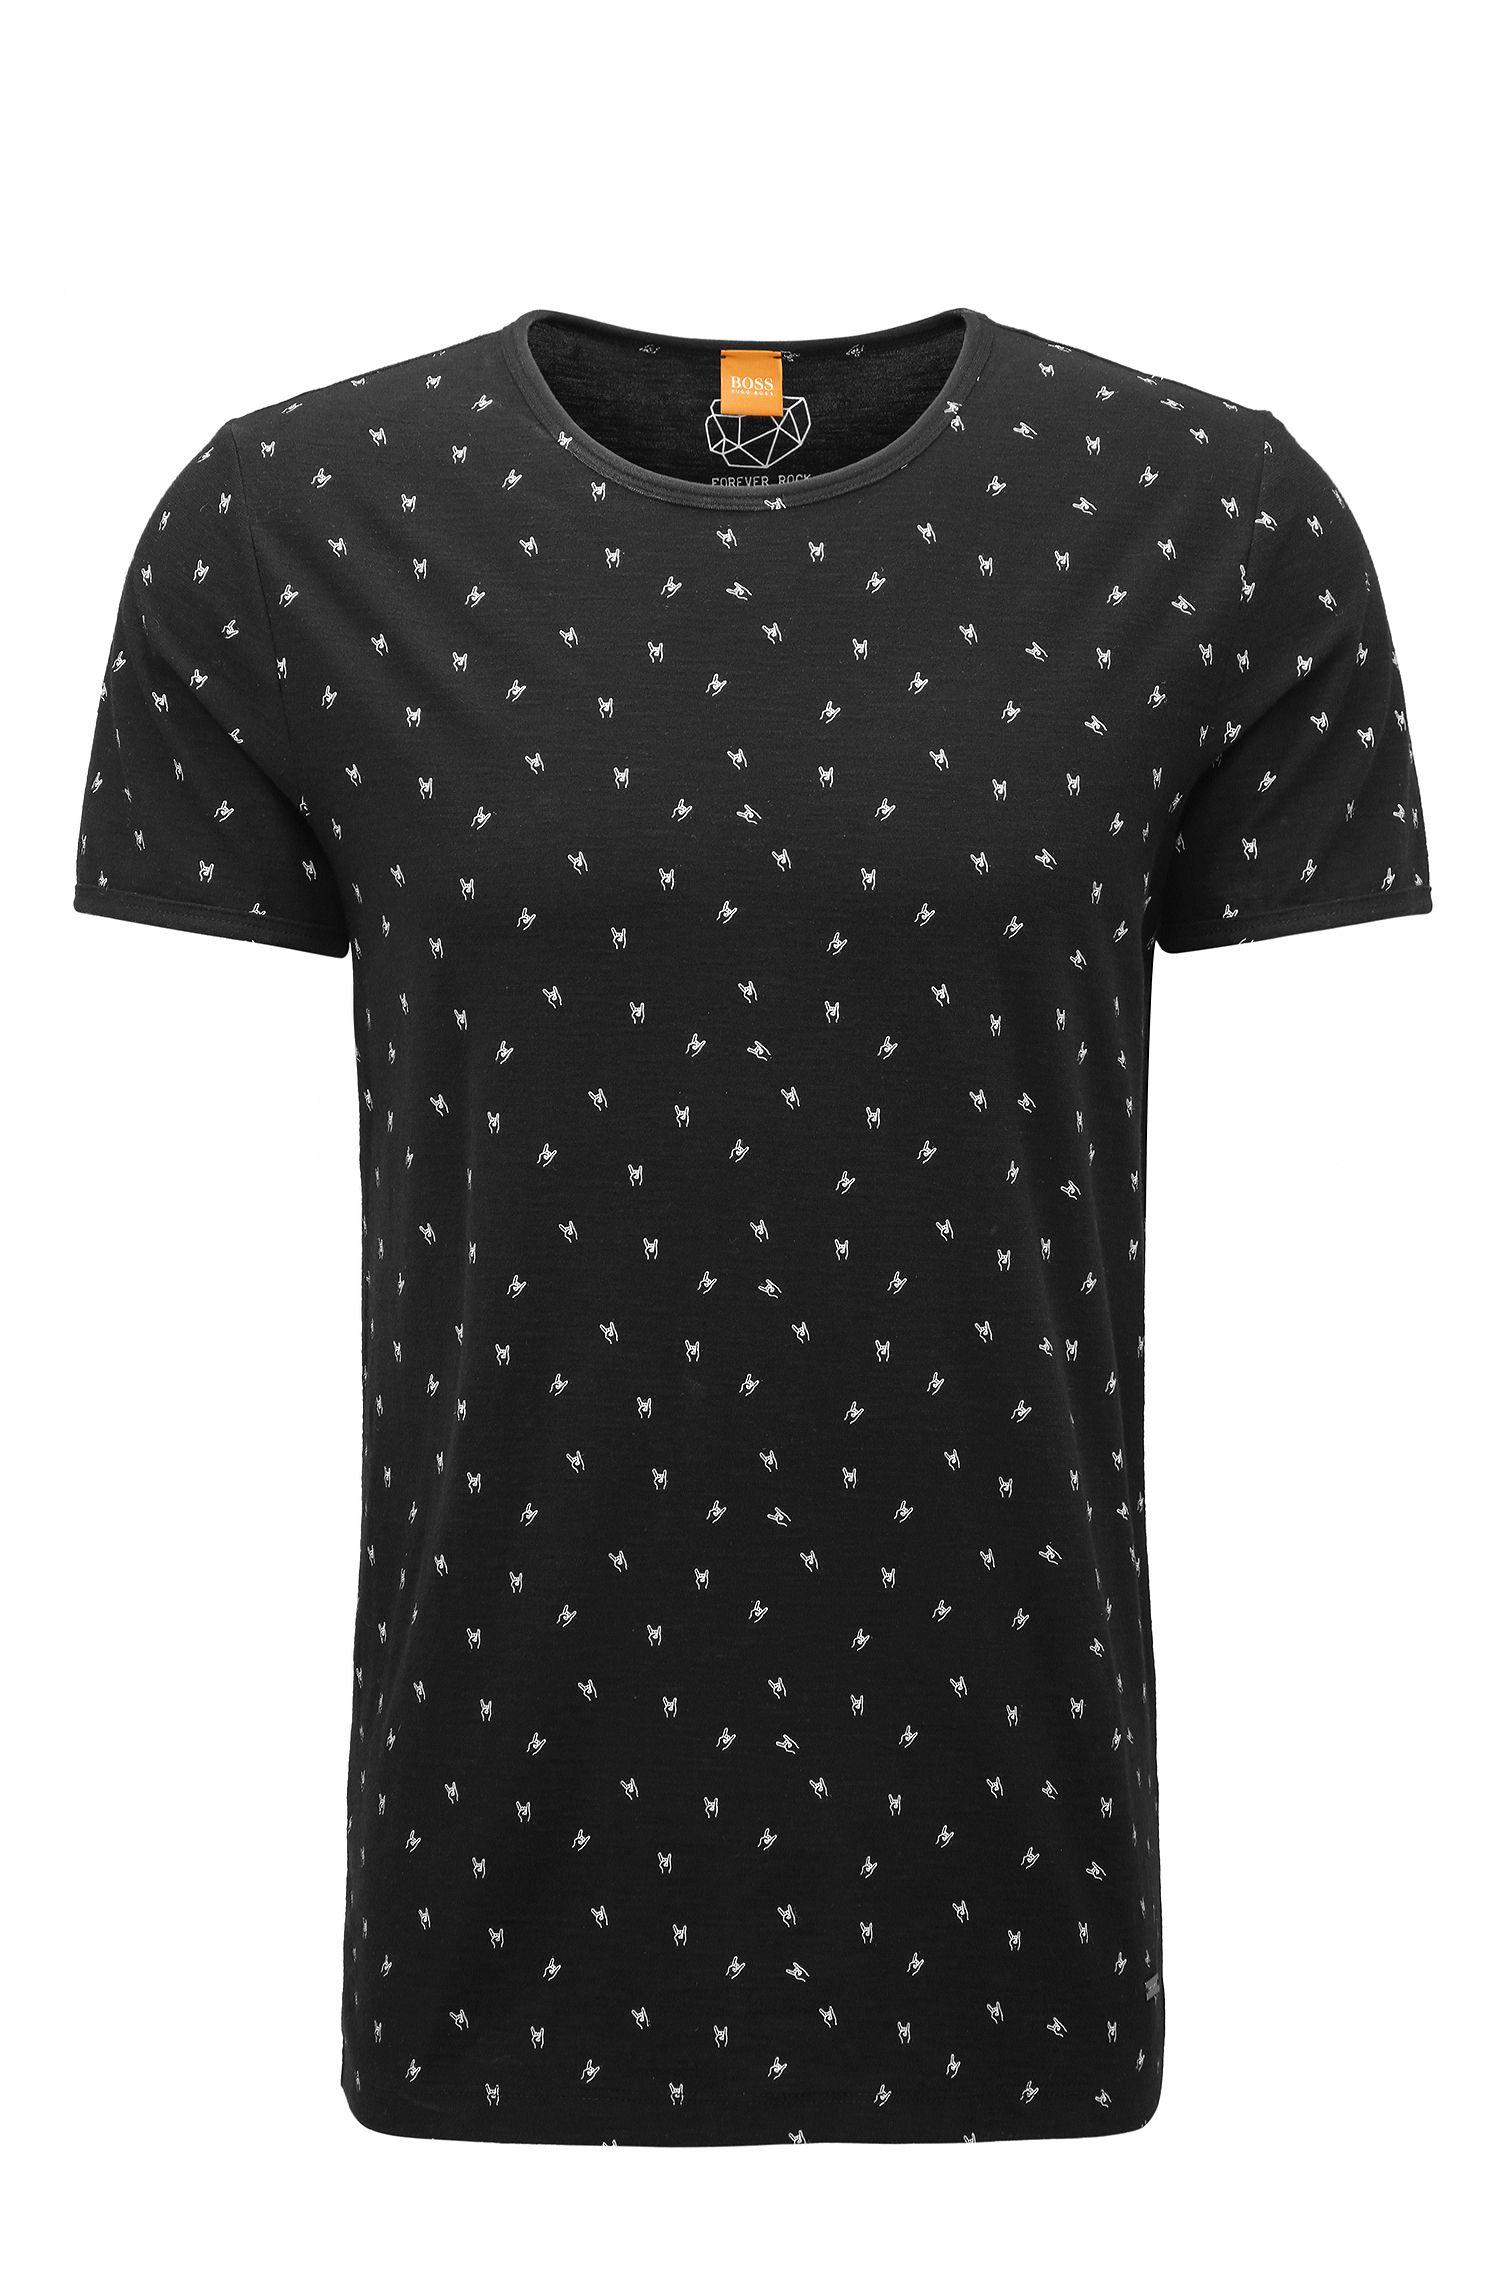 Printed Slub Jersey T-Shirt   Thoughts